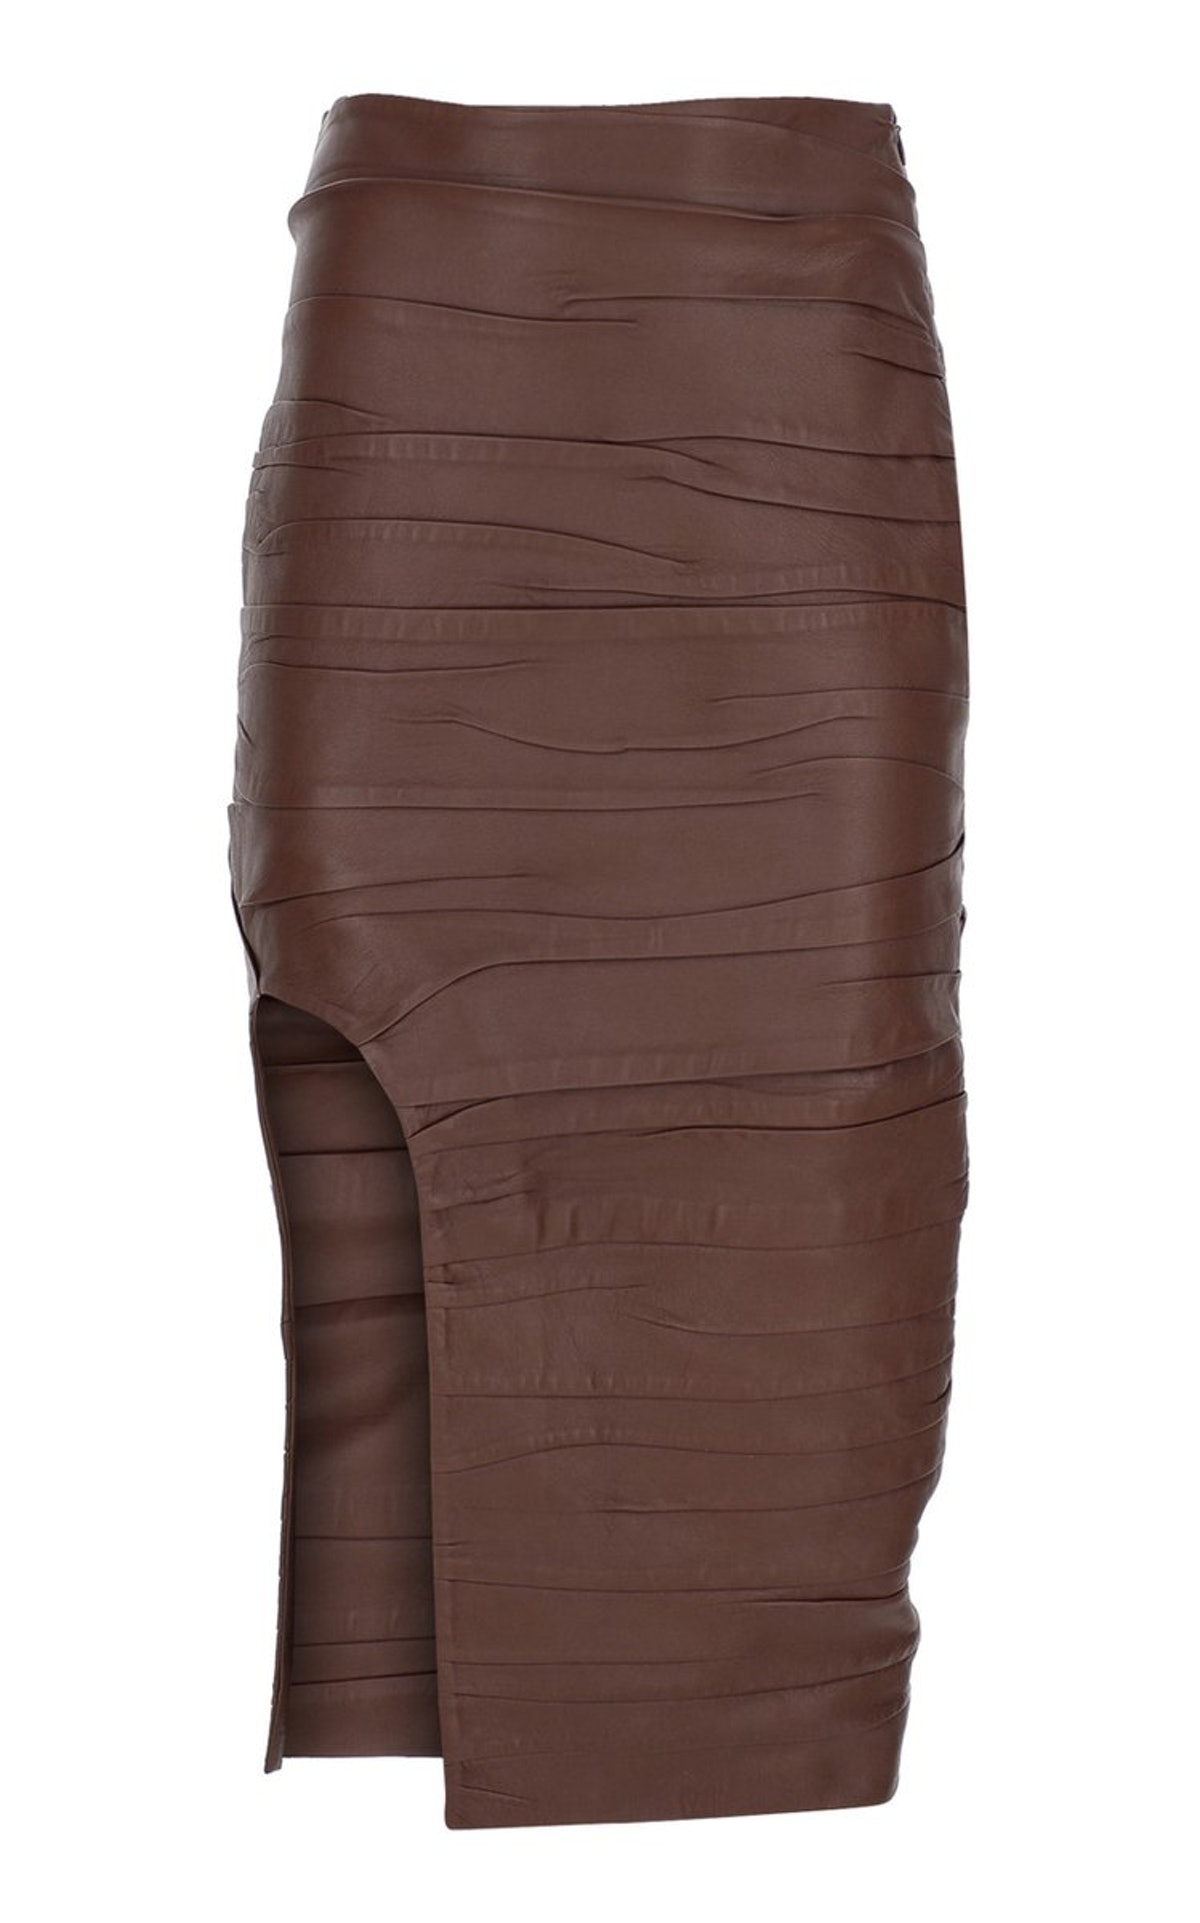 Zeynep Arçay Ruched Leather Midi Skirt